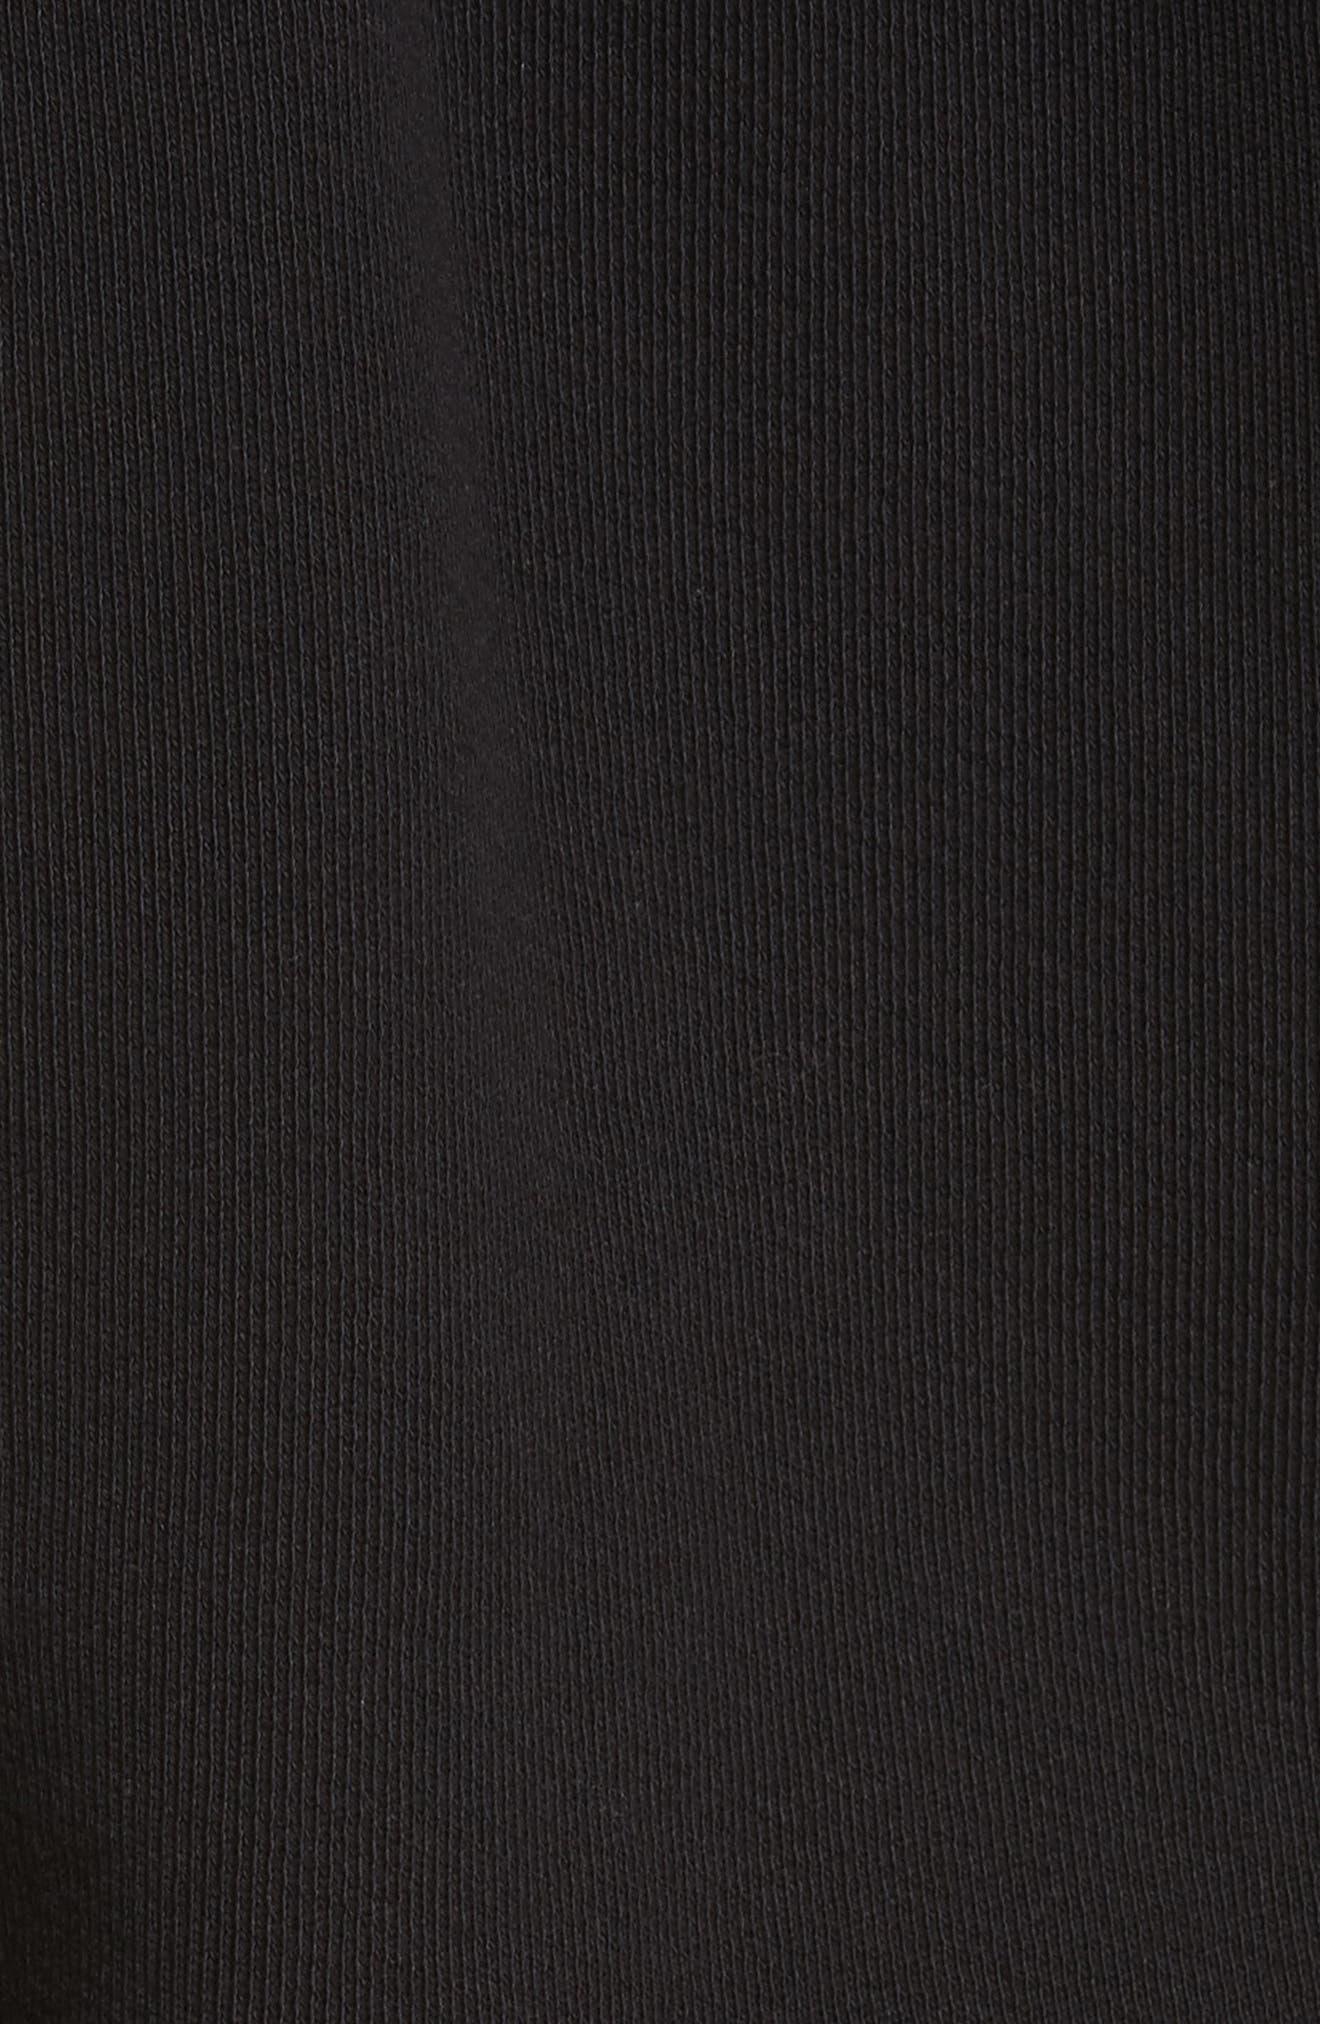 Shrunken Cotton Sweatshirt,                             Alternate thumbnail 5, color,                             001